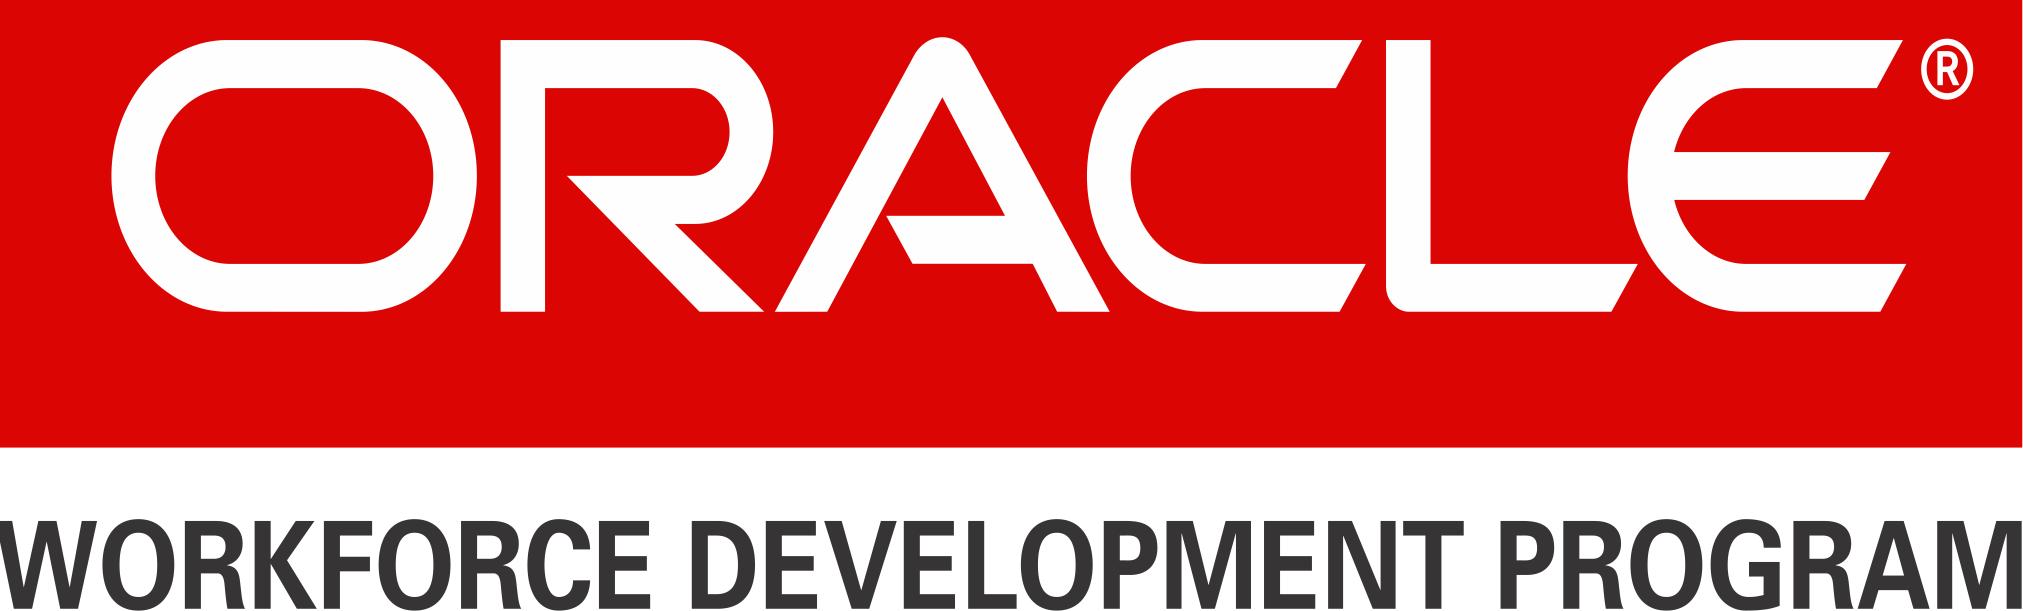 ORACLE WORKFORCE DEVELOPMENT PROGRAM (OWDP) - Indovision Services